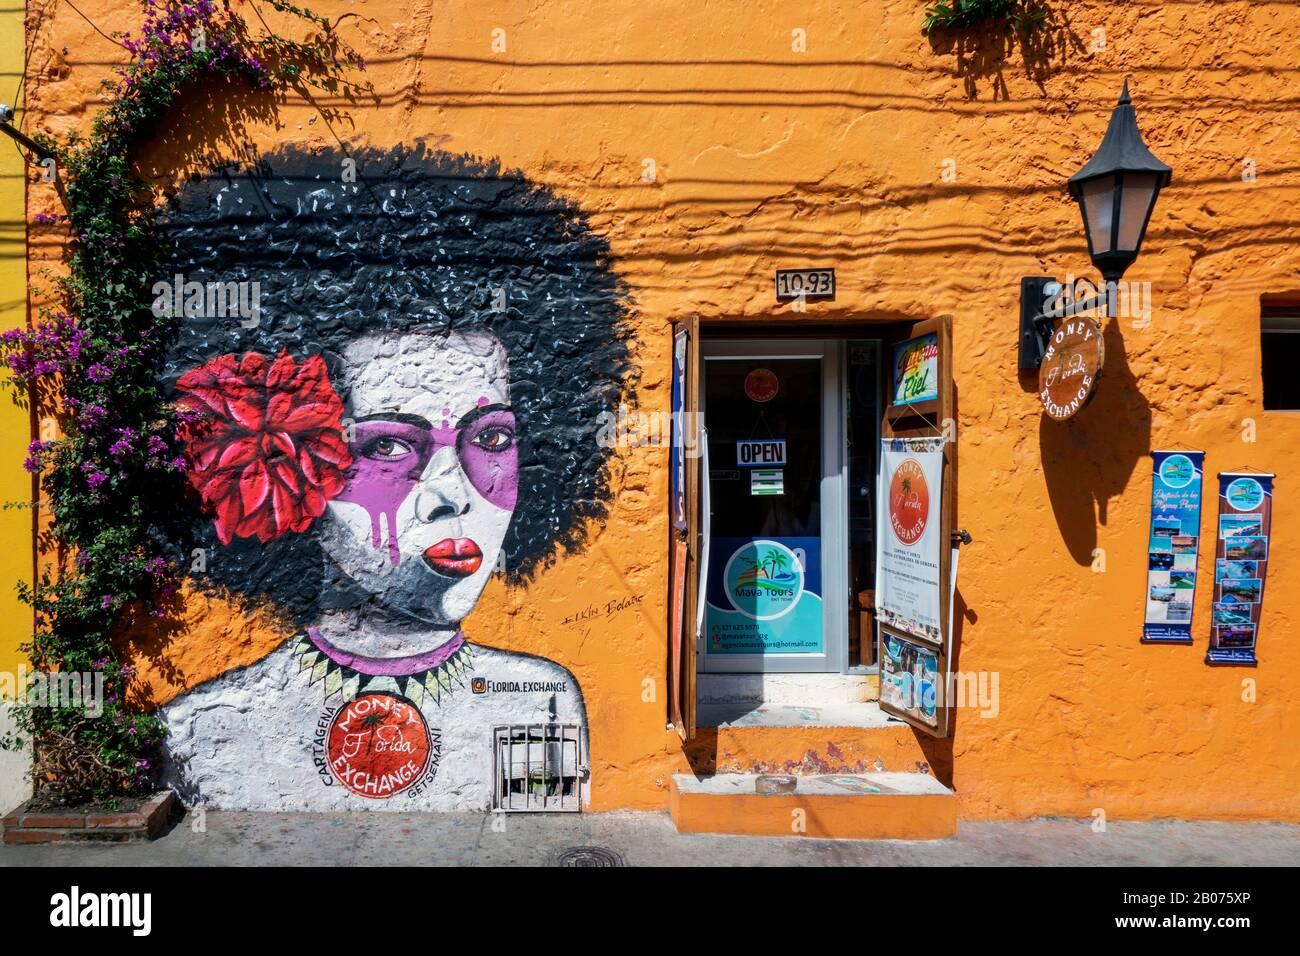 Cartagena, Colombia - January 23, 2020: Street art in Getsemani from Cartagena, Colombia, South America Stock Photo